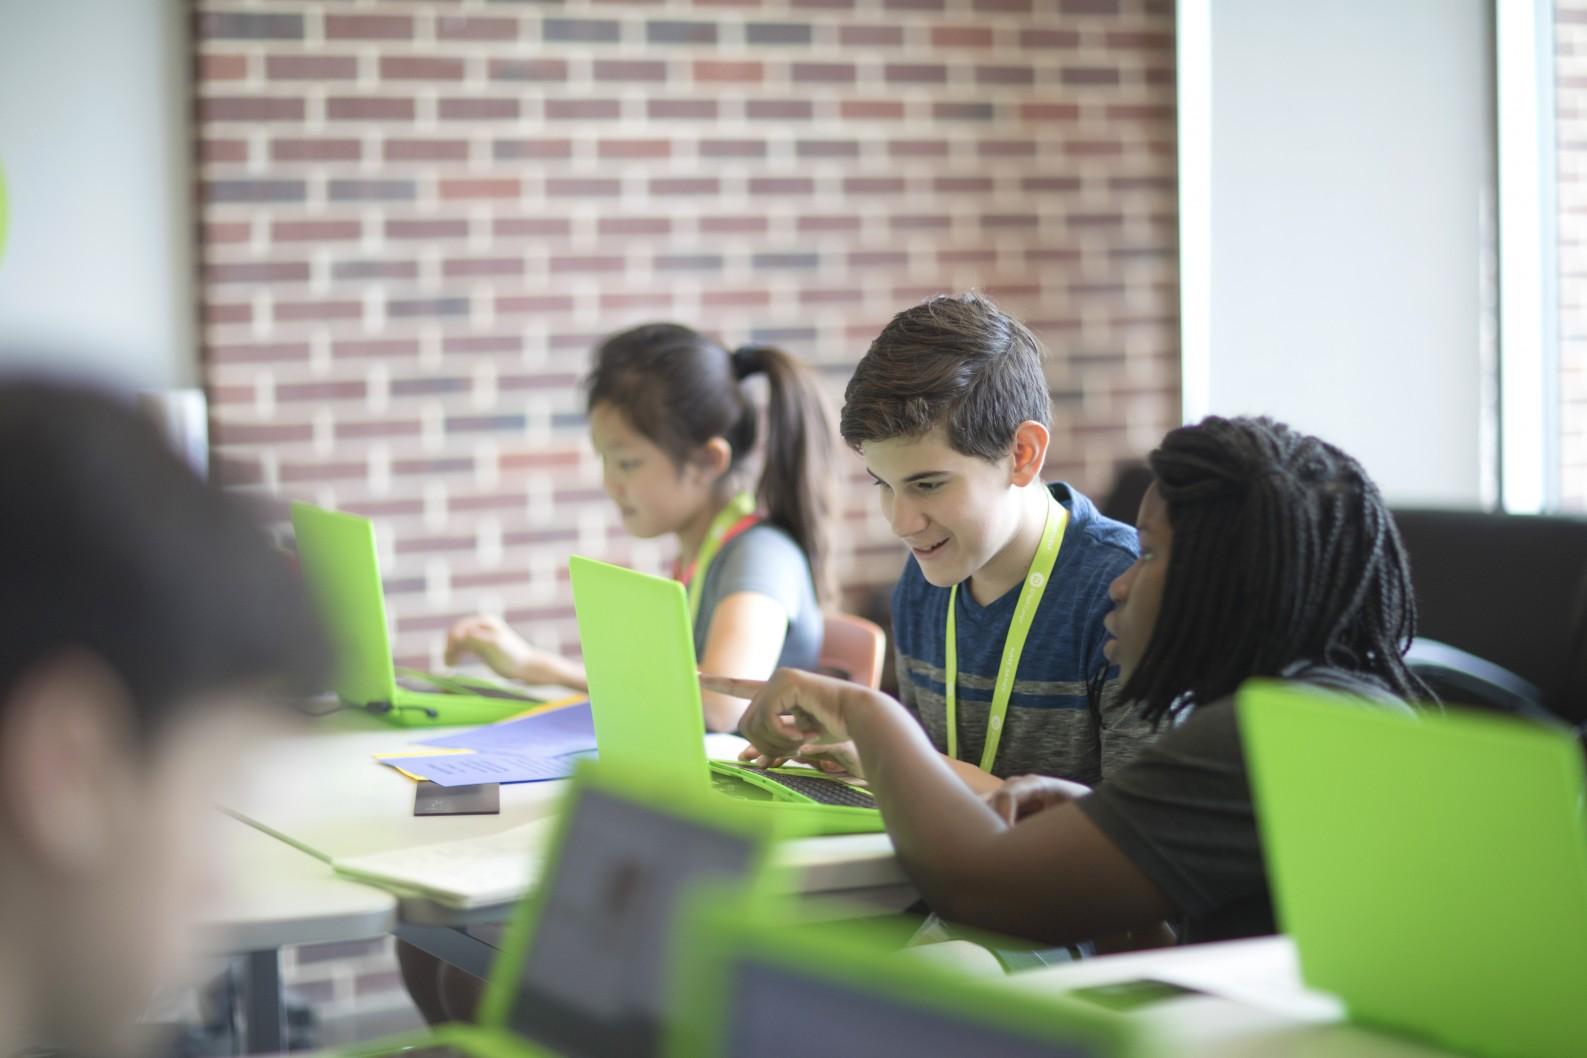 Summer Program - Technology | iD Tech Camps | Held at Vanderbilt University